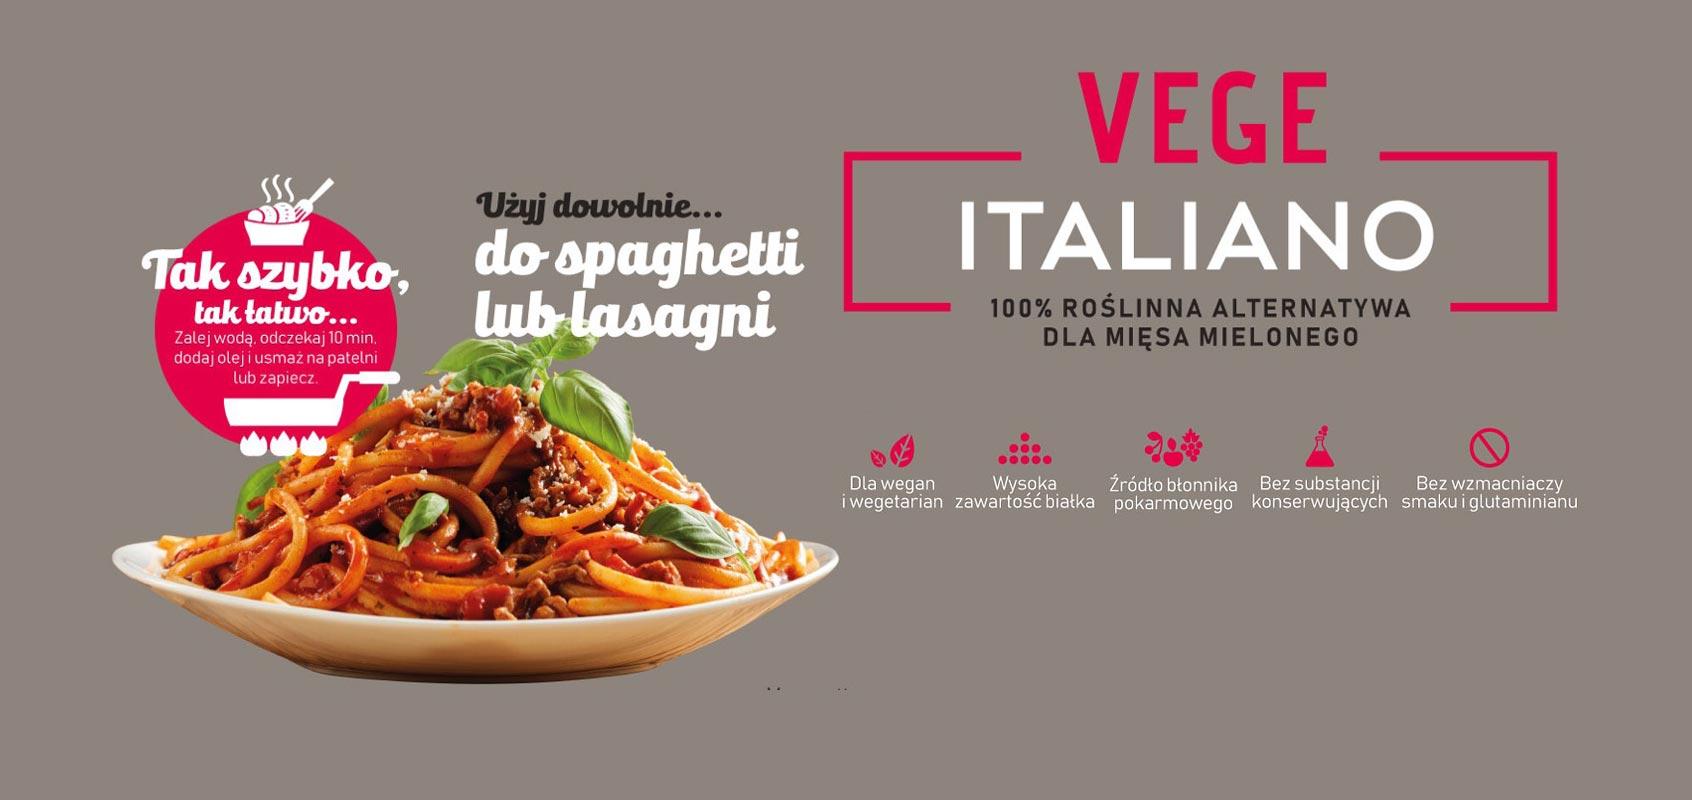 vege-italiano